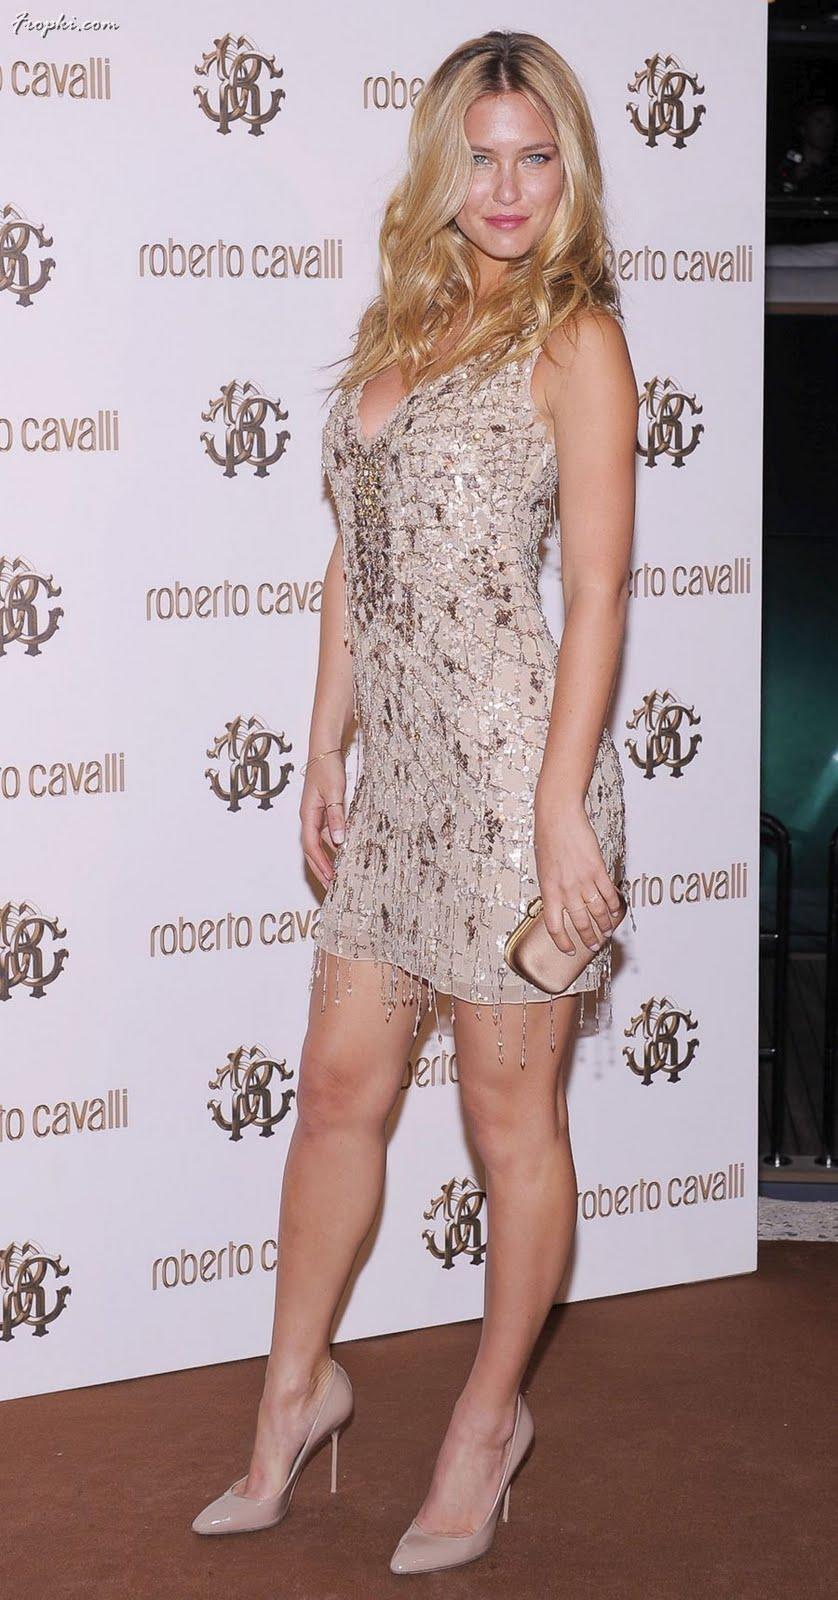 Model Bar Refaeli attends the private dinner on Cavalli